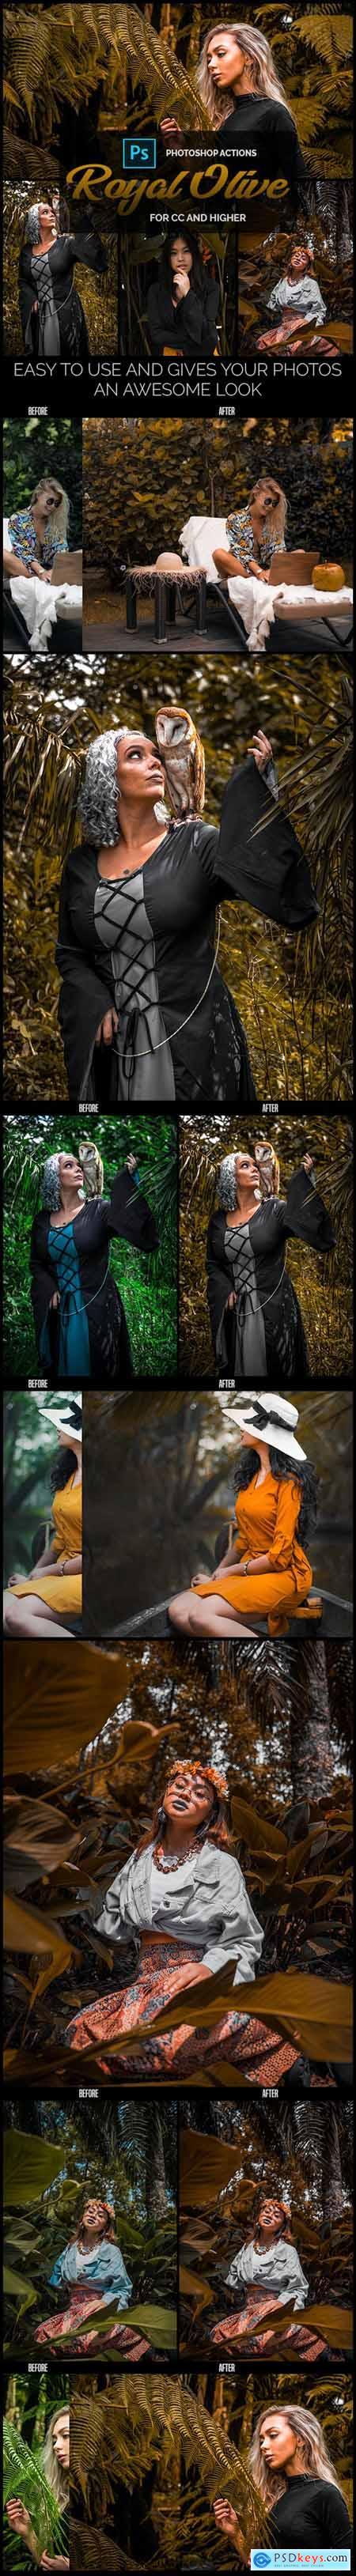 Royal Olive - Premium Photoshop Actions 26566682